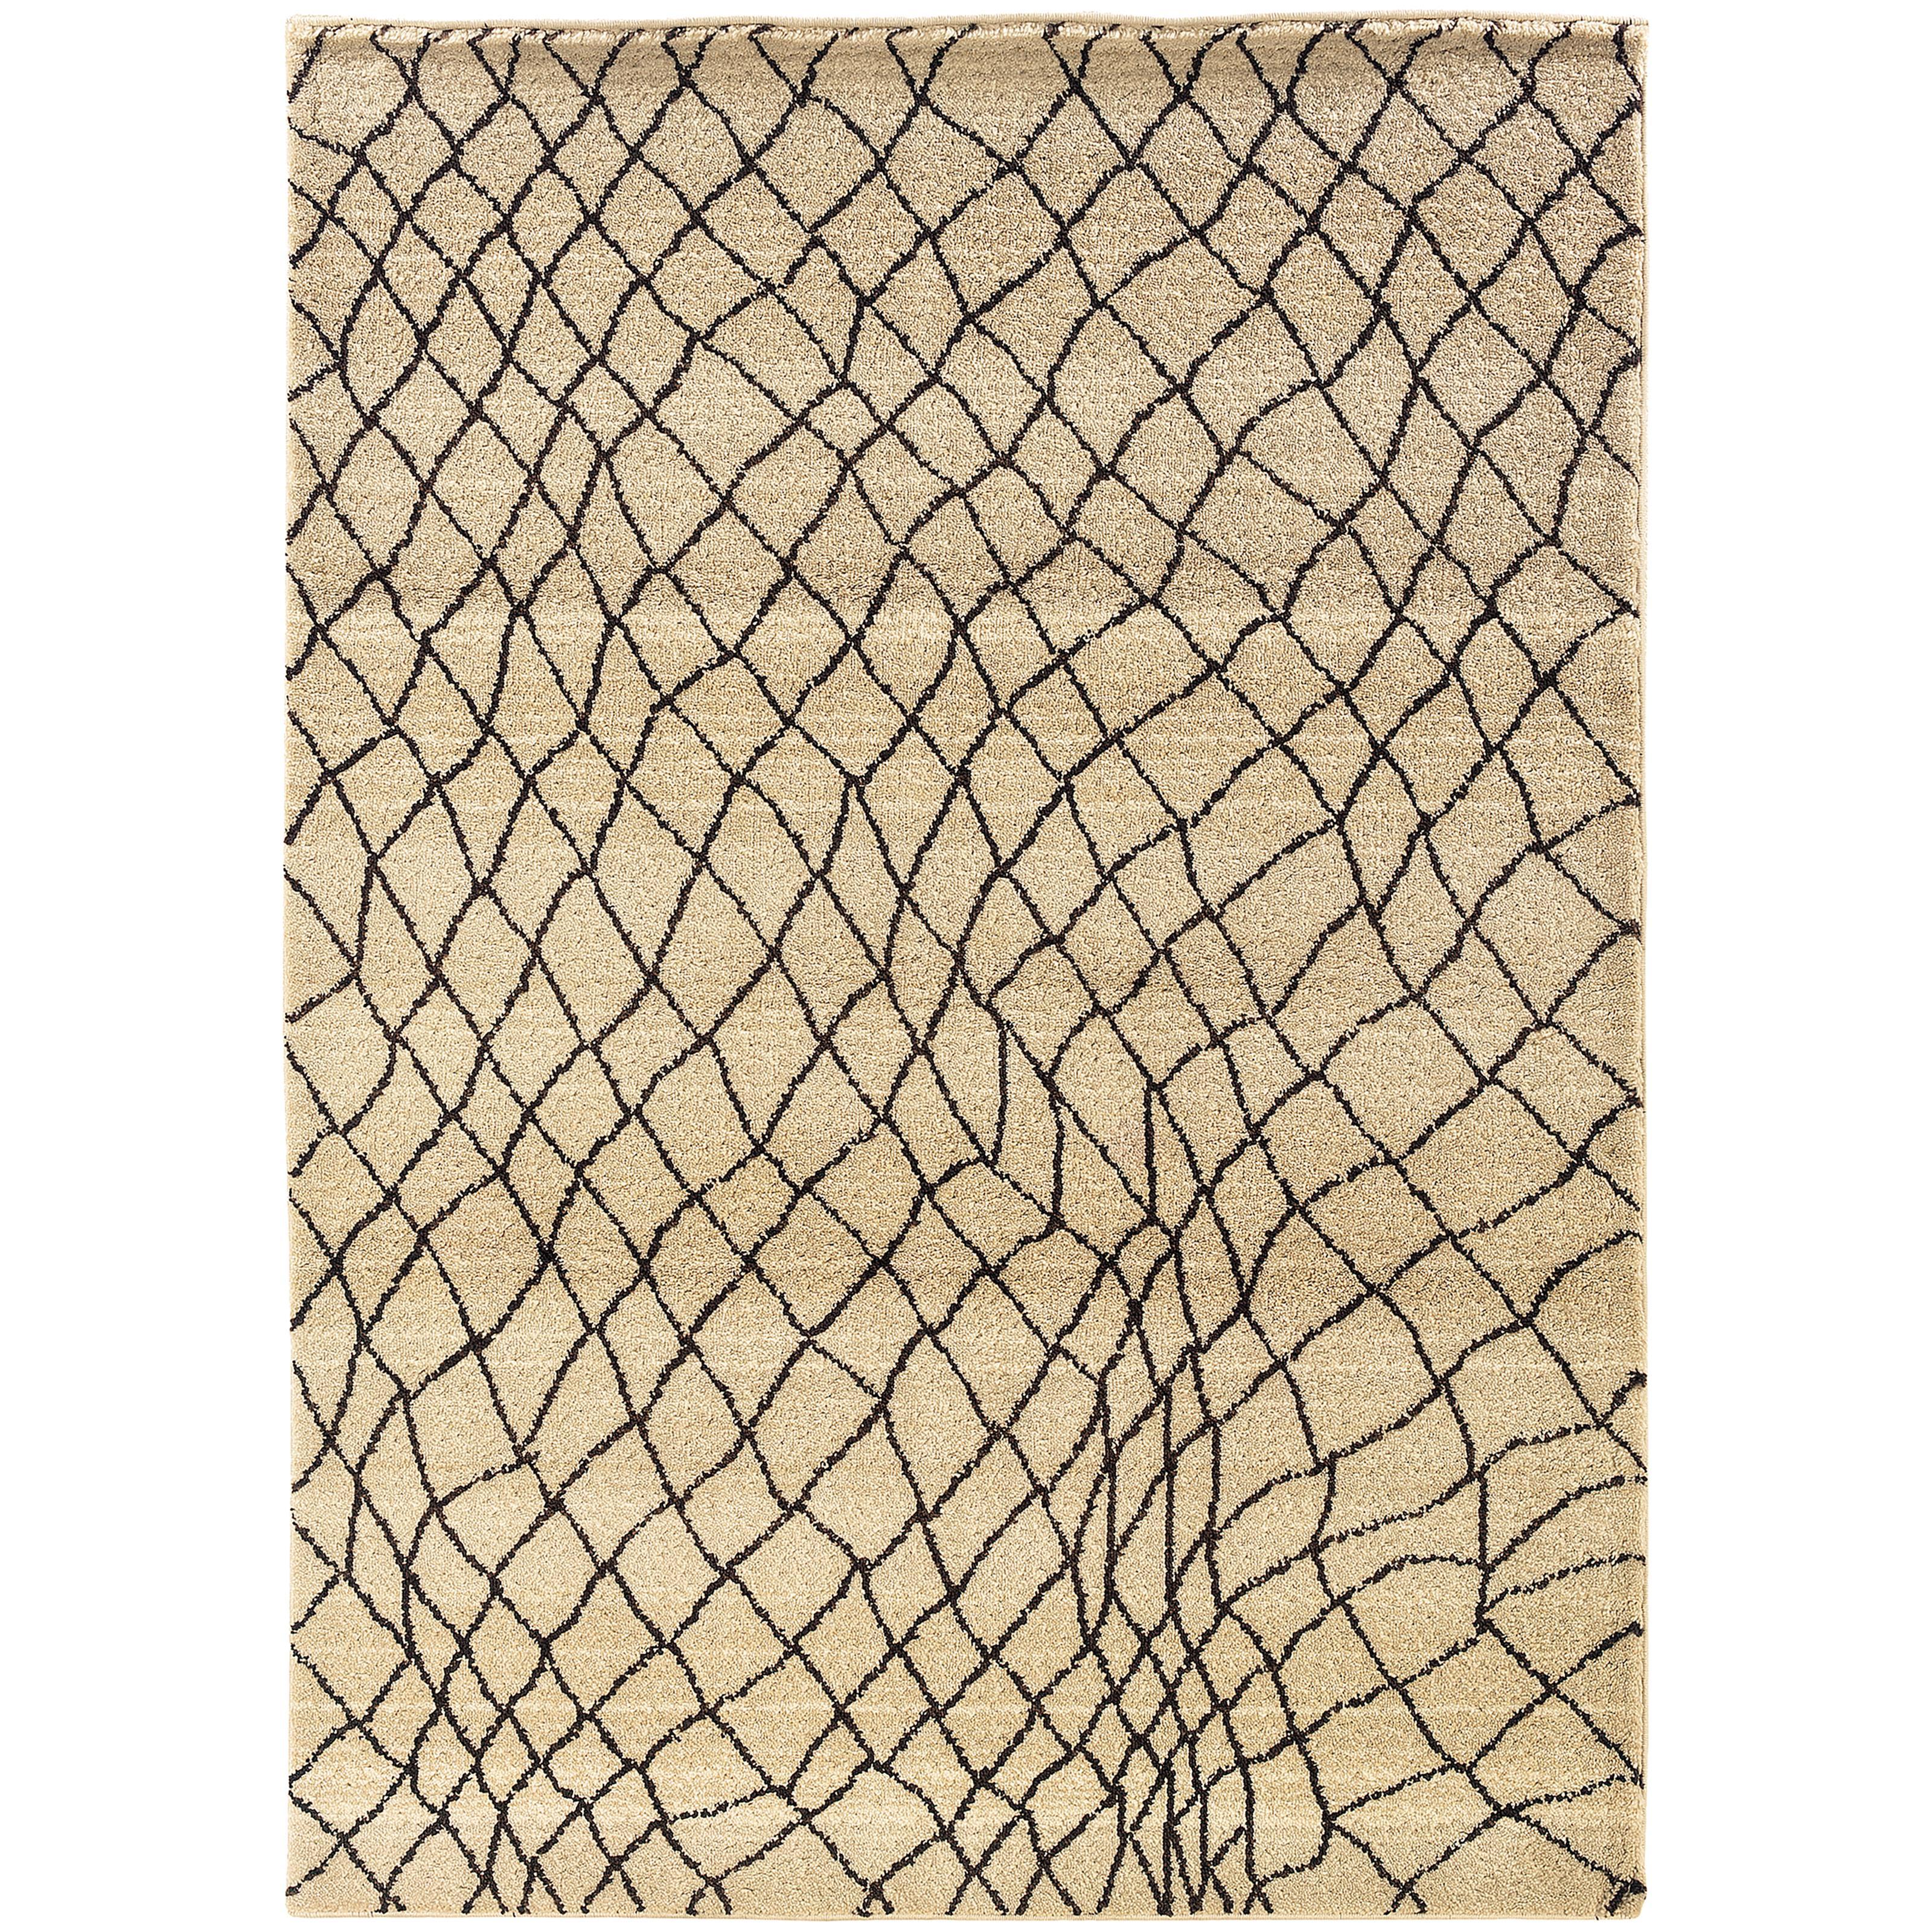 "Marrakesh 7'10"" X 10'10"" Rug by Oriental Weavers at HomeWorld Furniture"